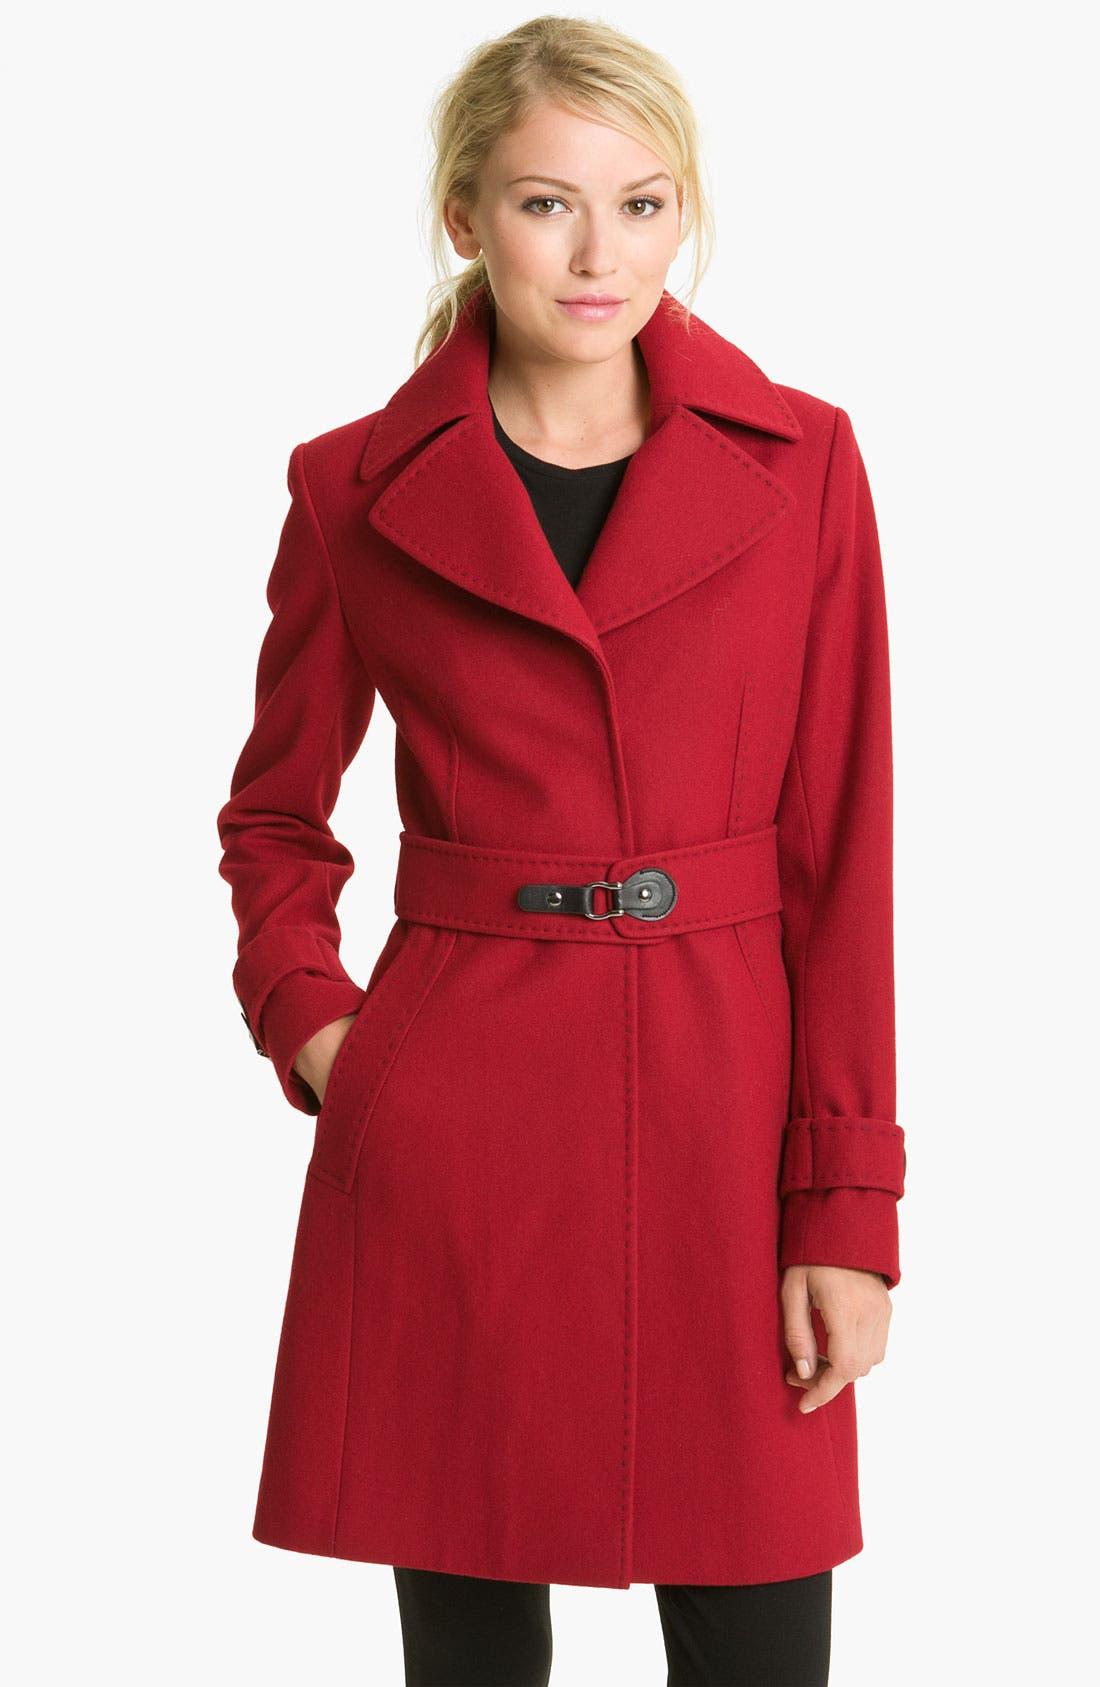 Main Image - Via Spiga 'Dora' Pickstitch Detail Wool Blend Coat